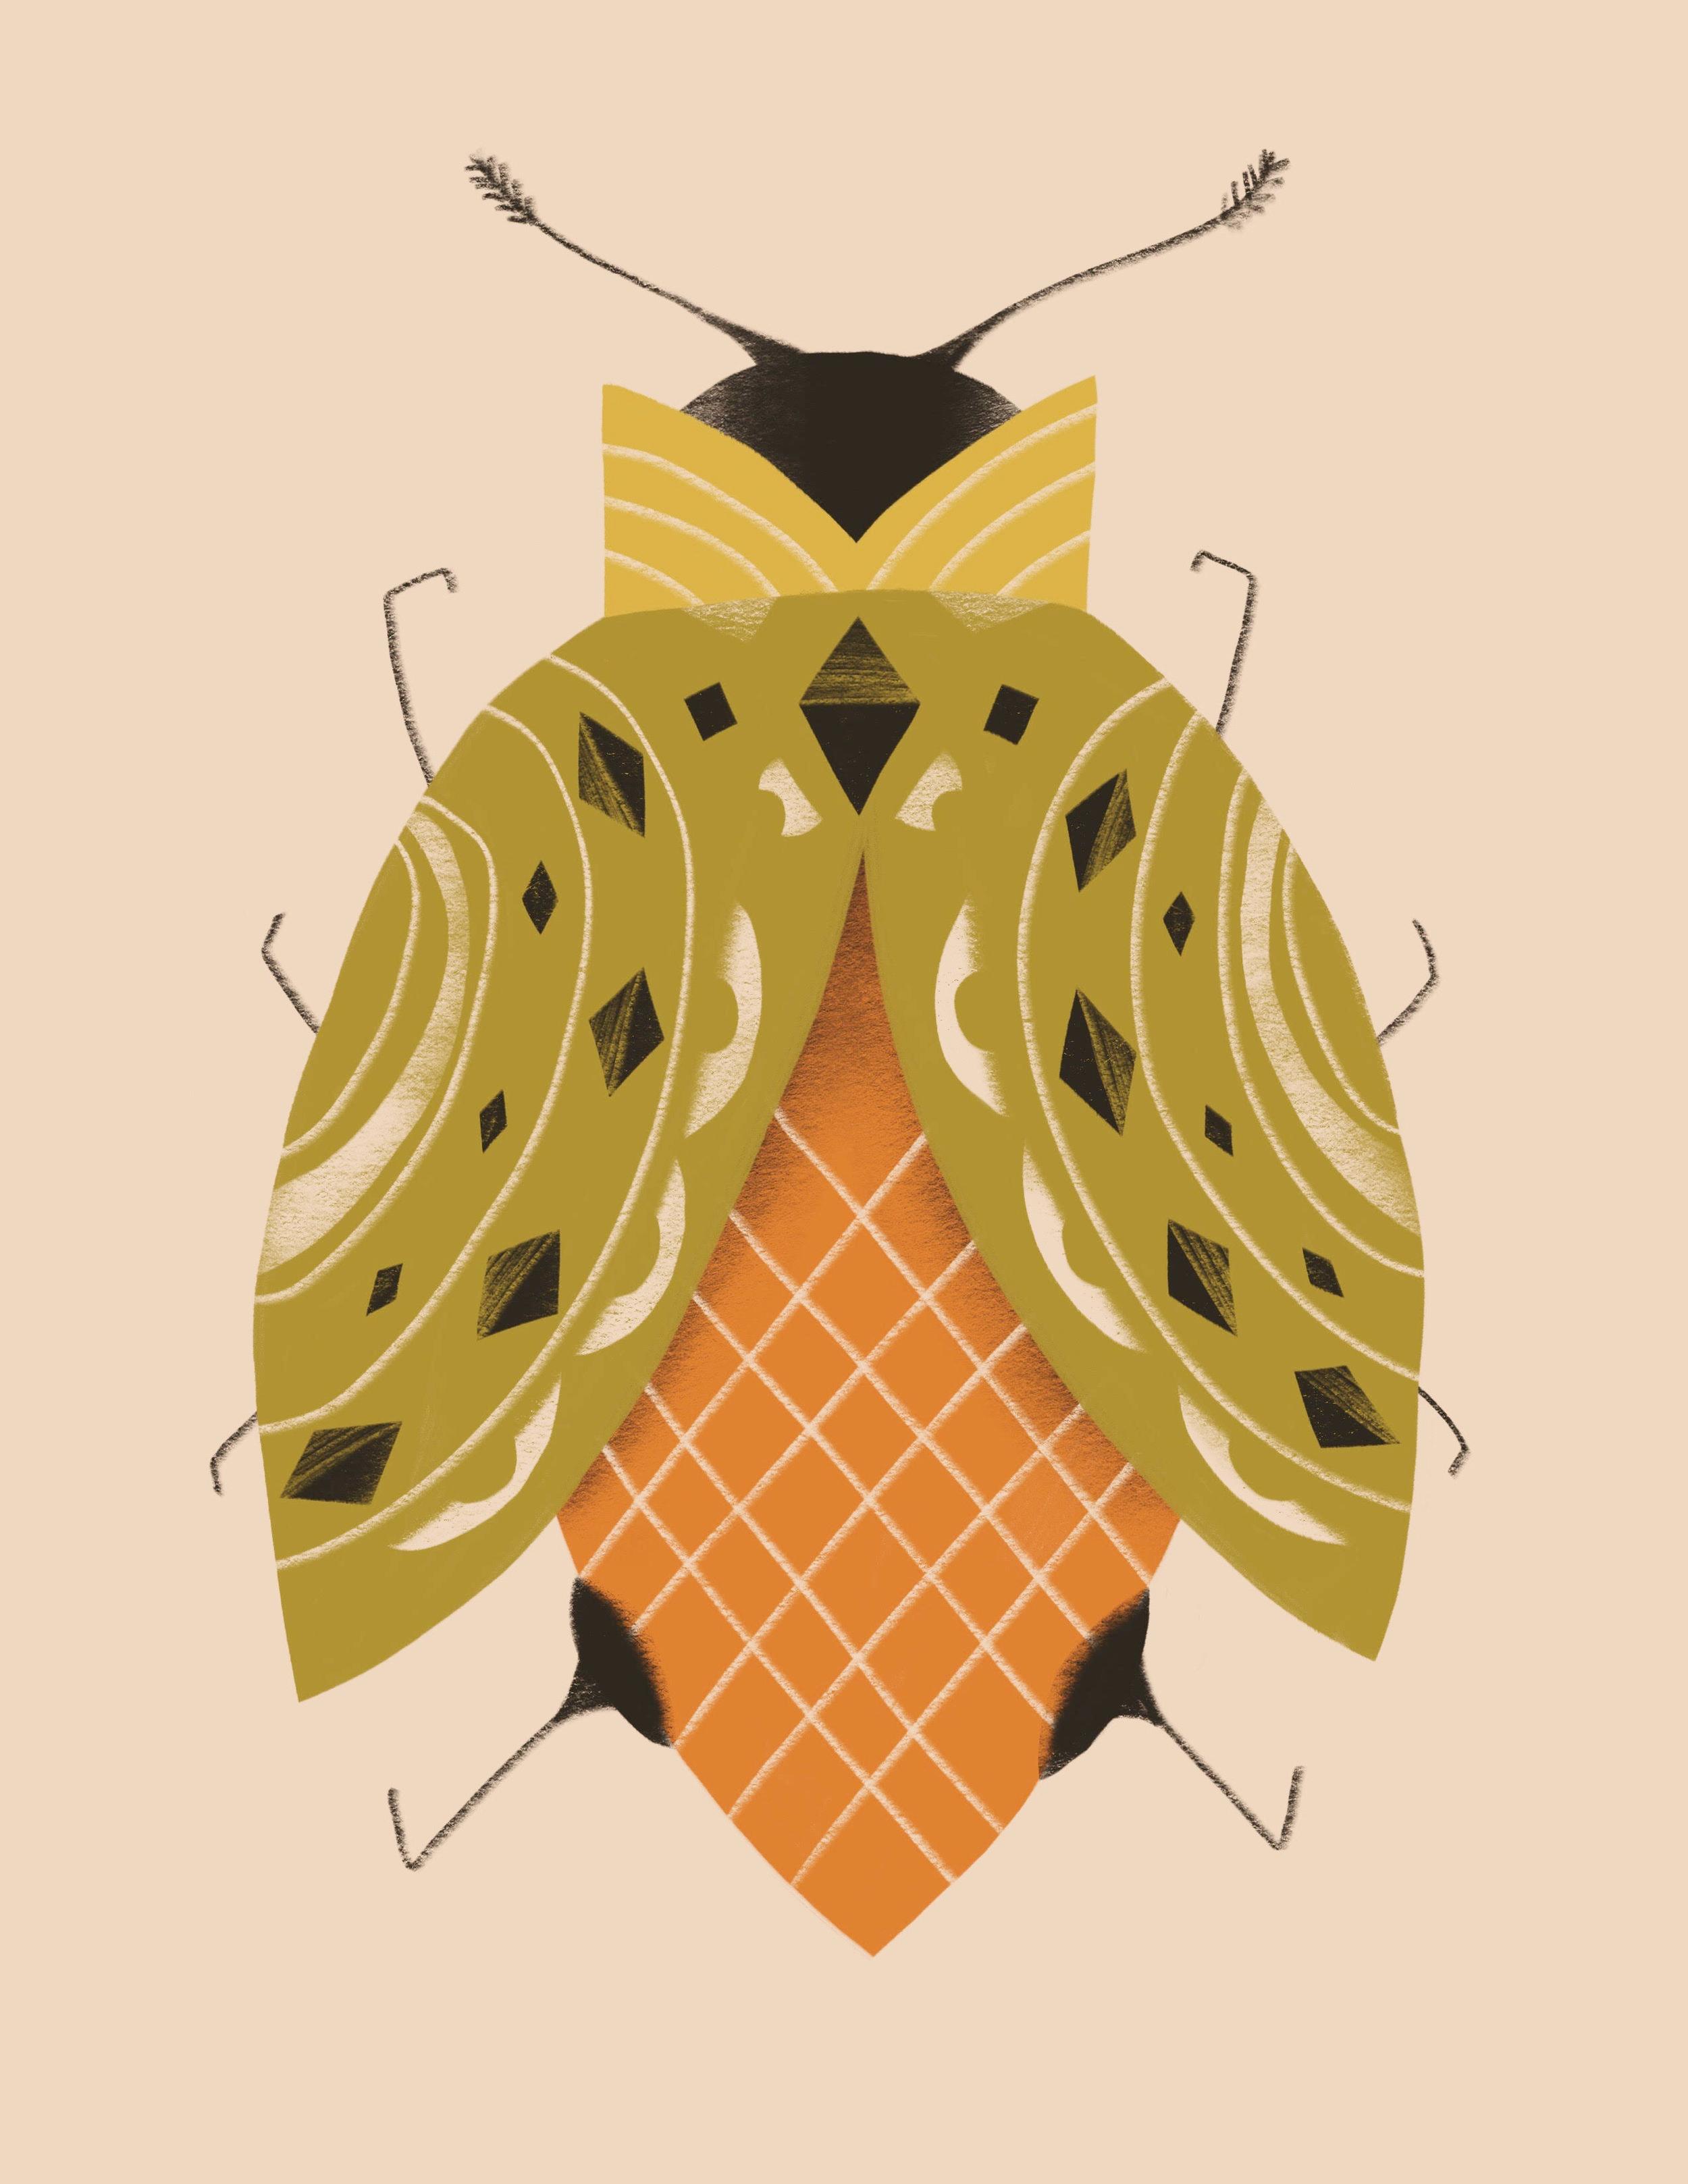 beige-bug-illustration-erin-wallace.jpg